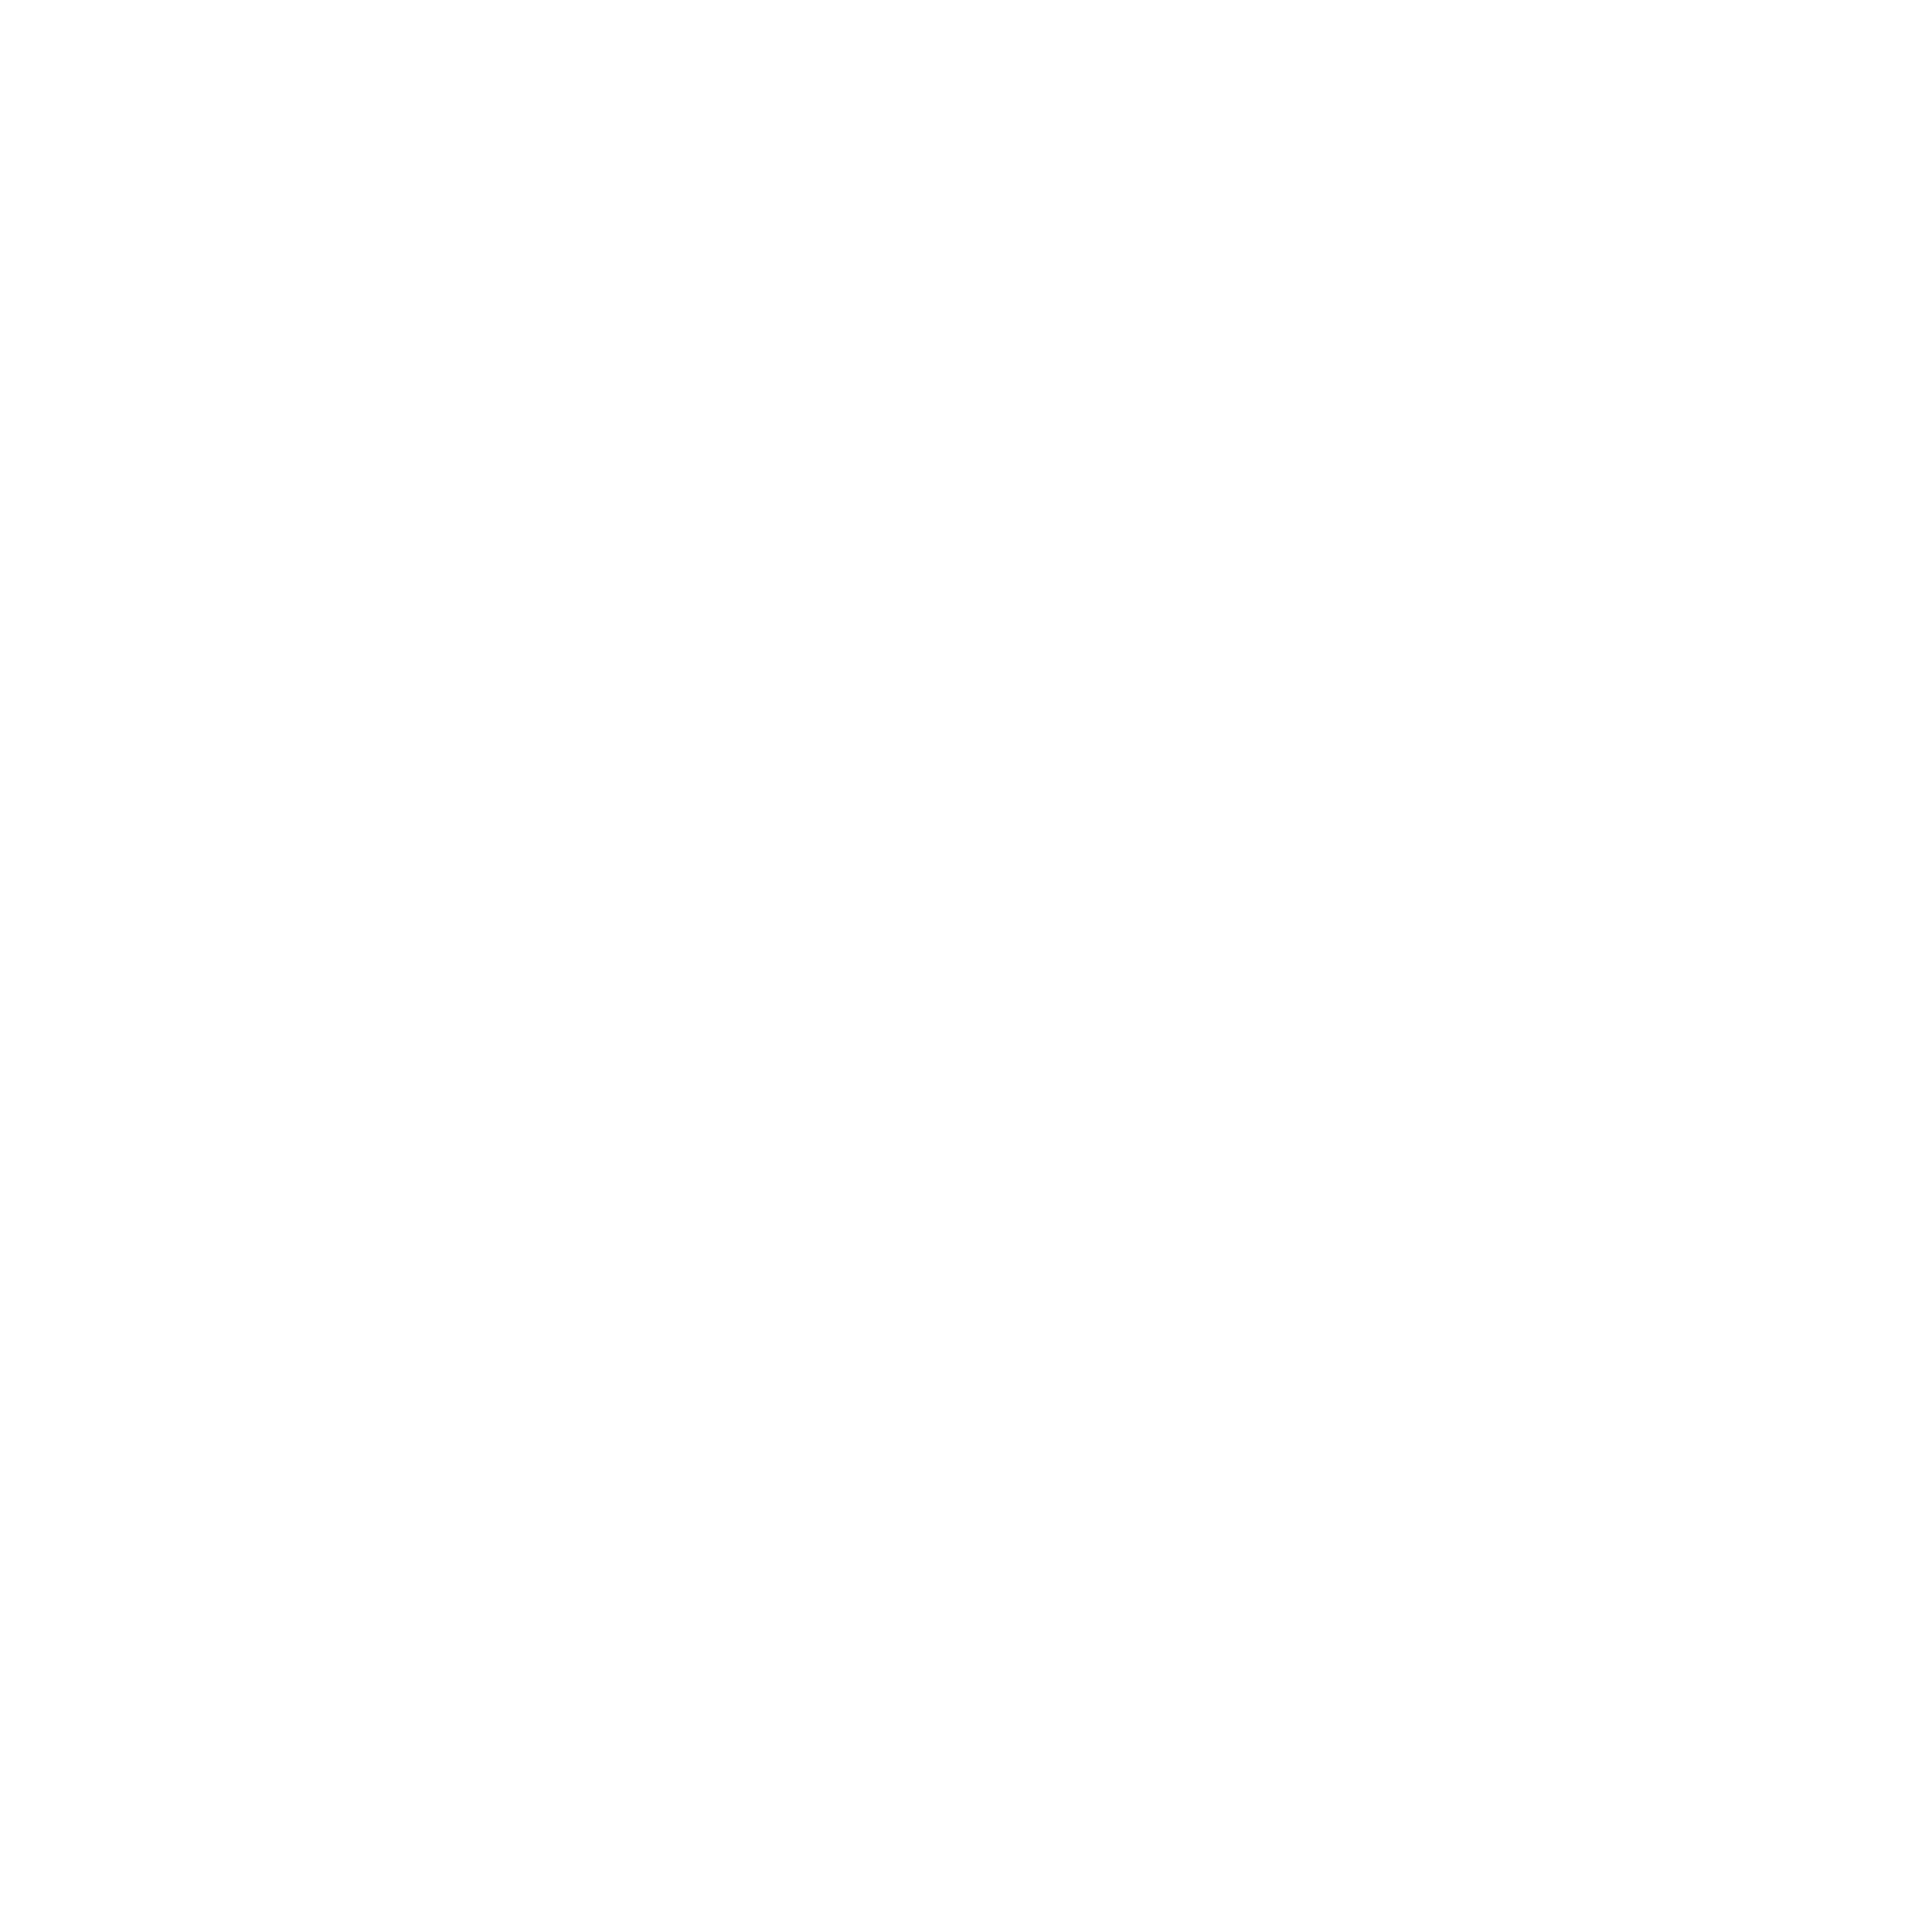 ONDULATOIRE